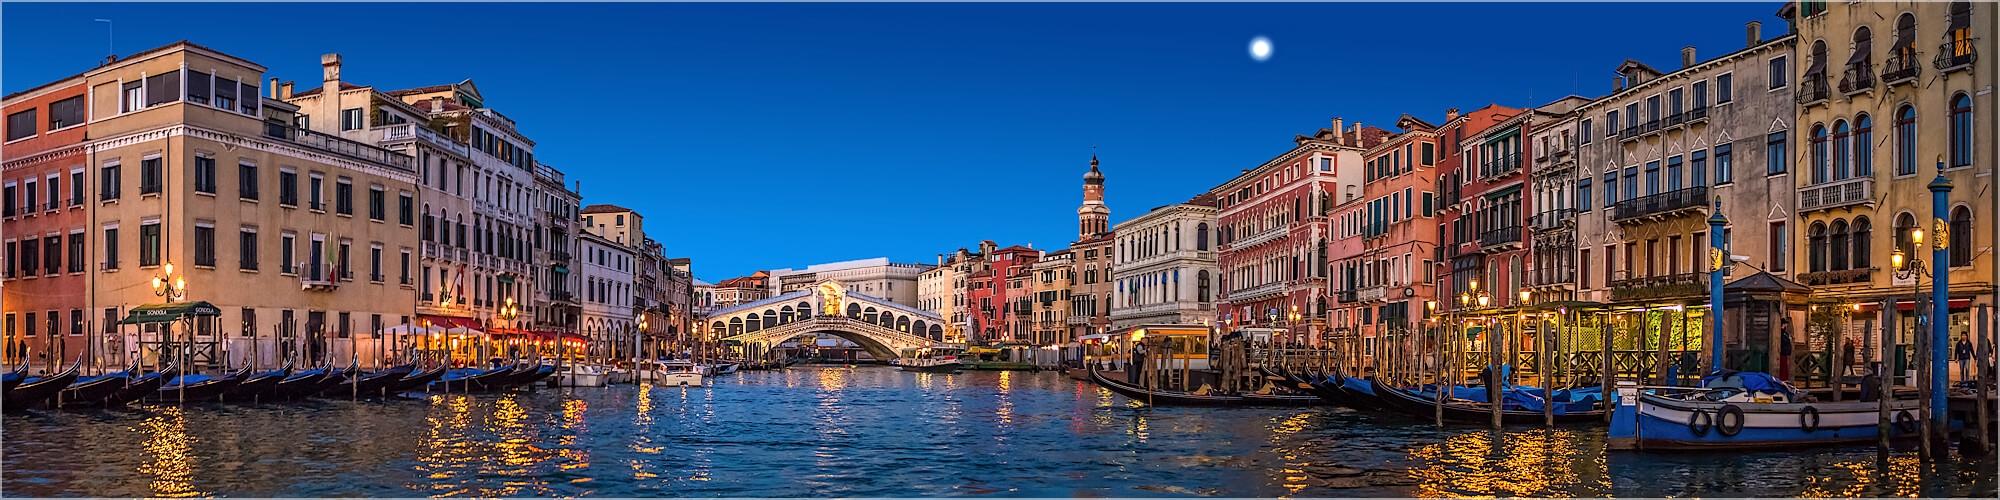 Panoramabild Venedig Italien der Canal Grande